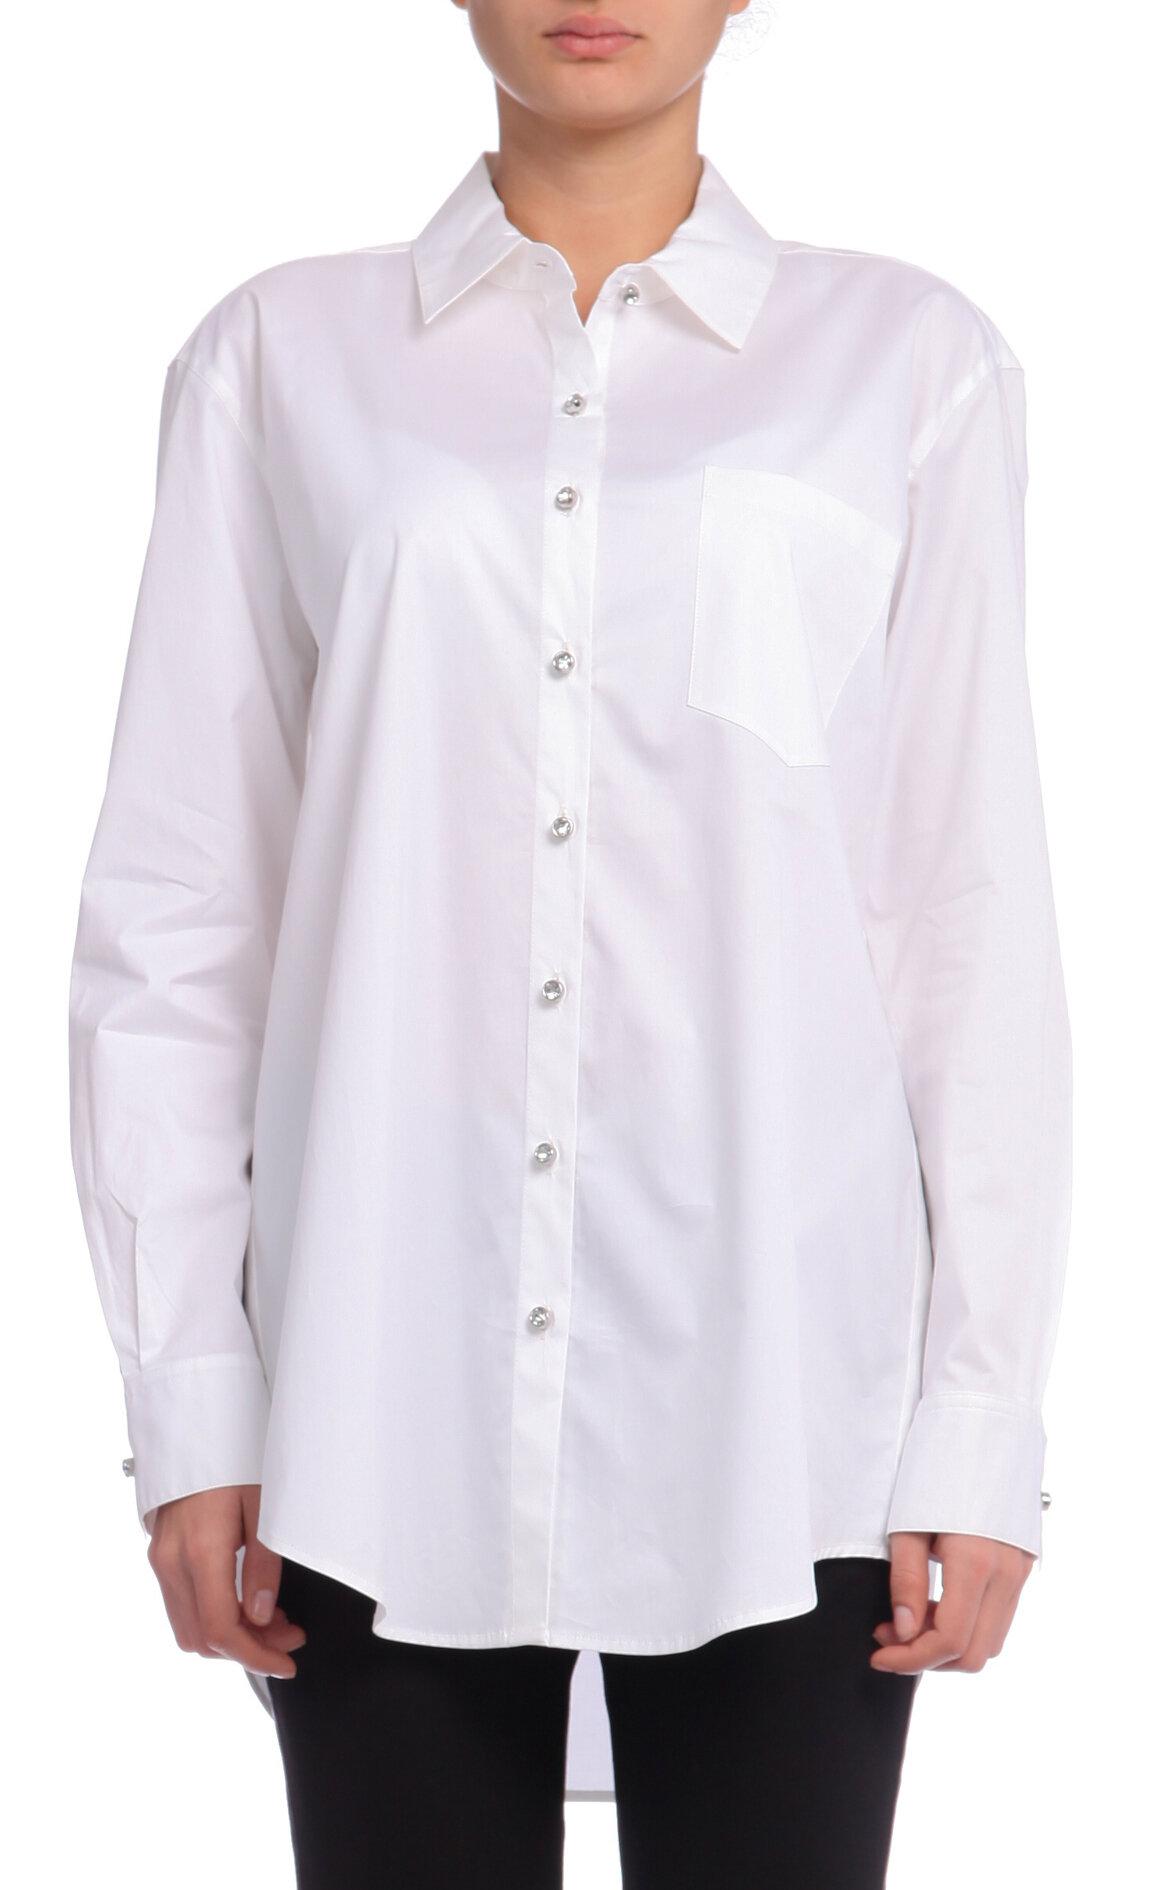 DKNY-DKNY Beyaz Gömlek